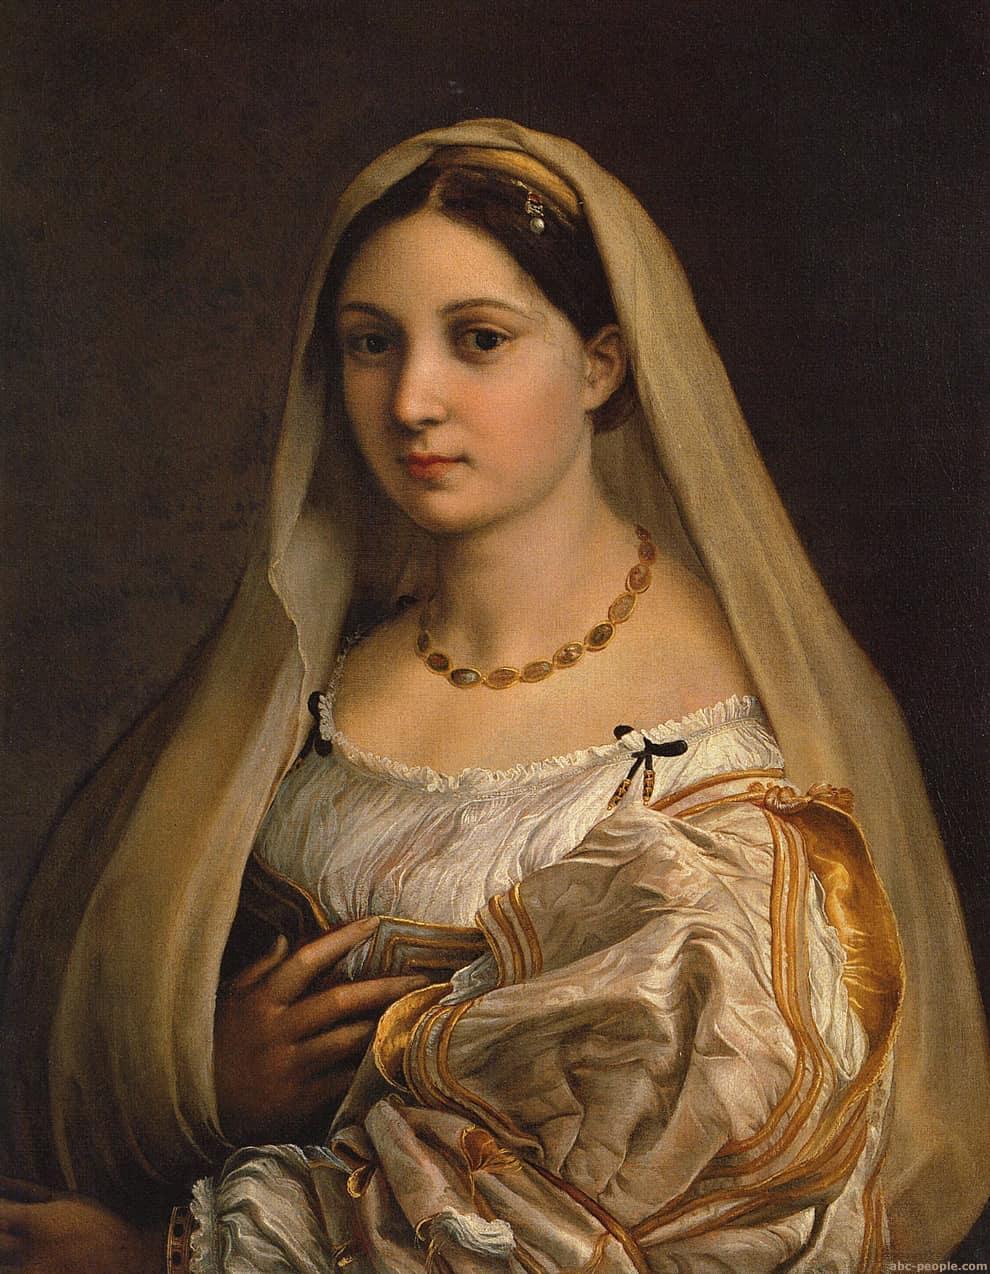 RAFAEL, La Velata - Žena sa velom, Palazzo Pitti, Firenca